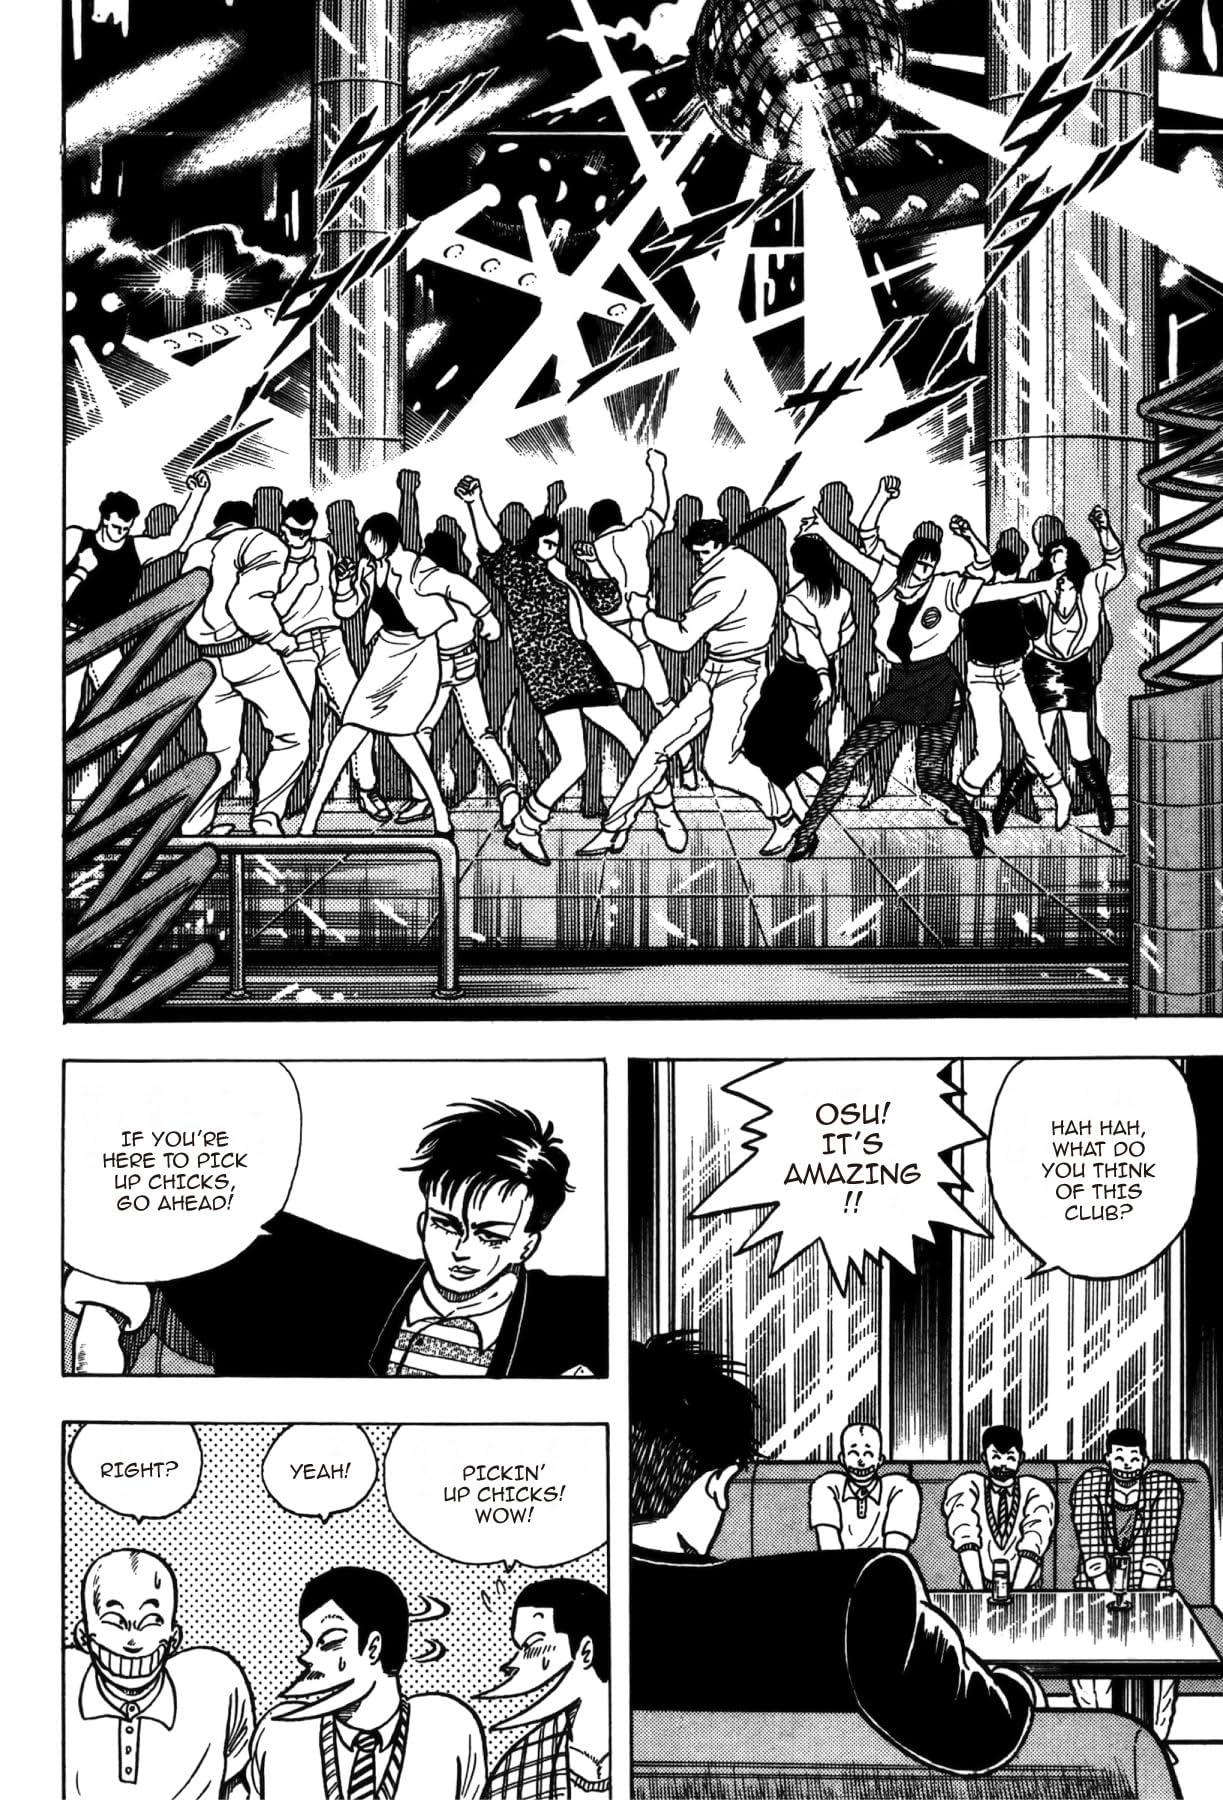 Osu! Karate Club #26